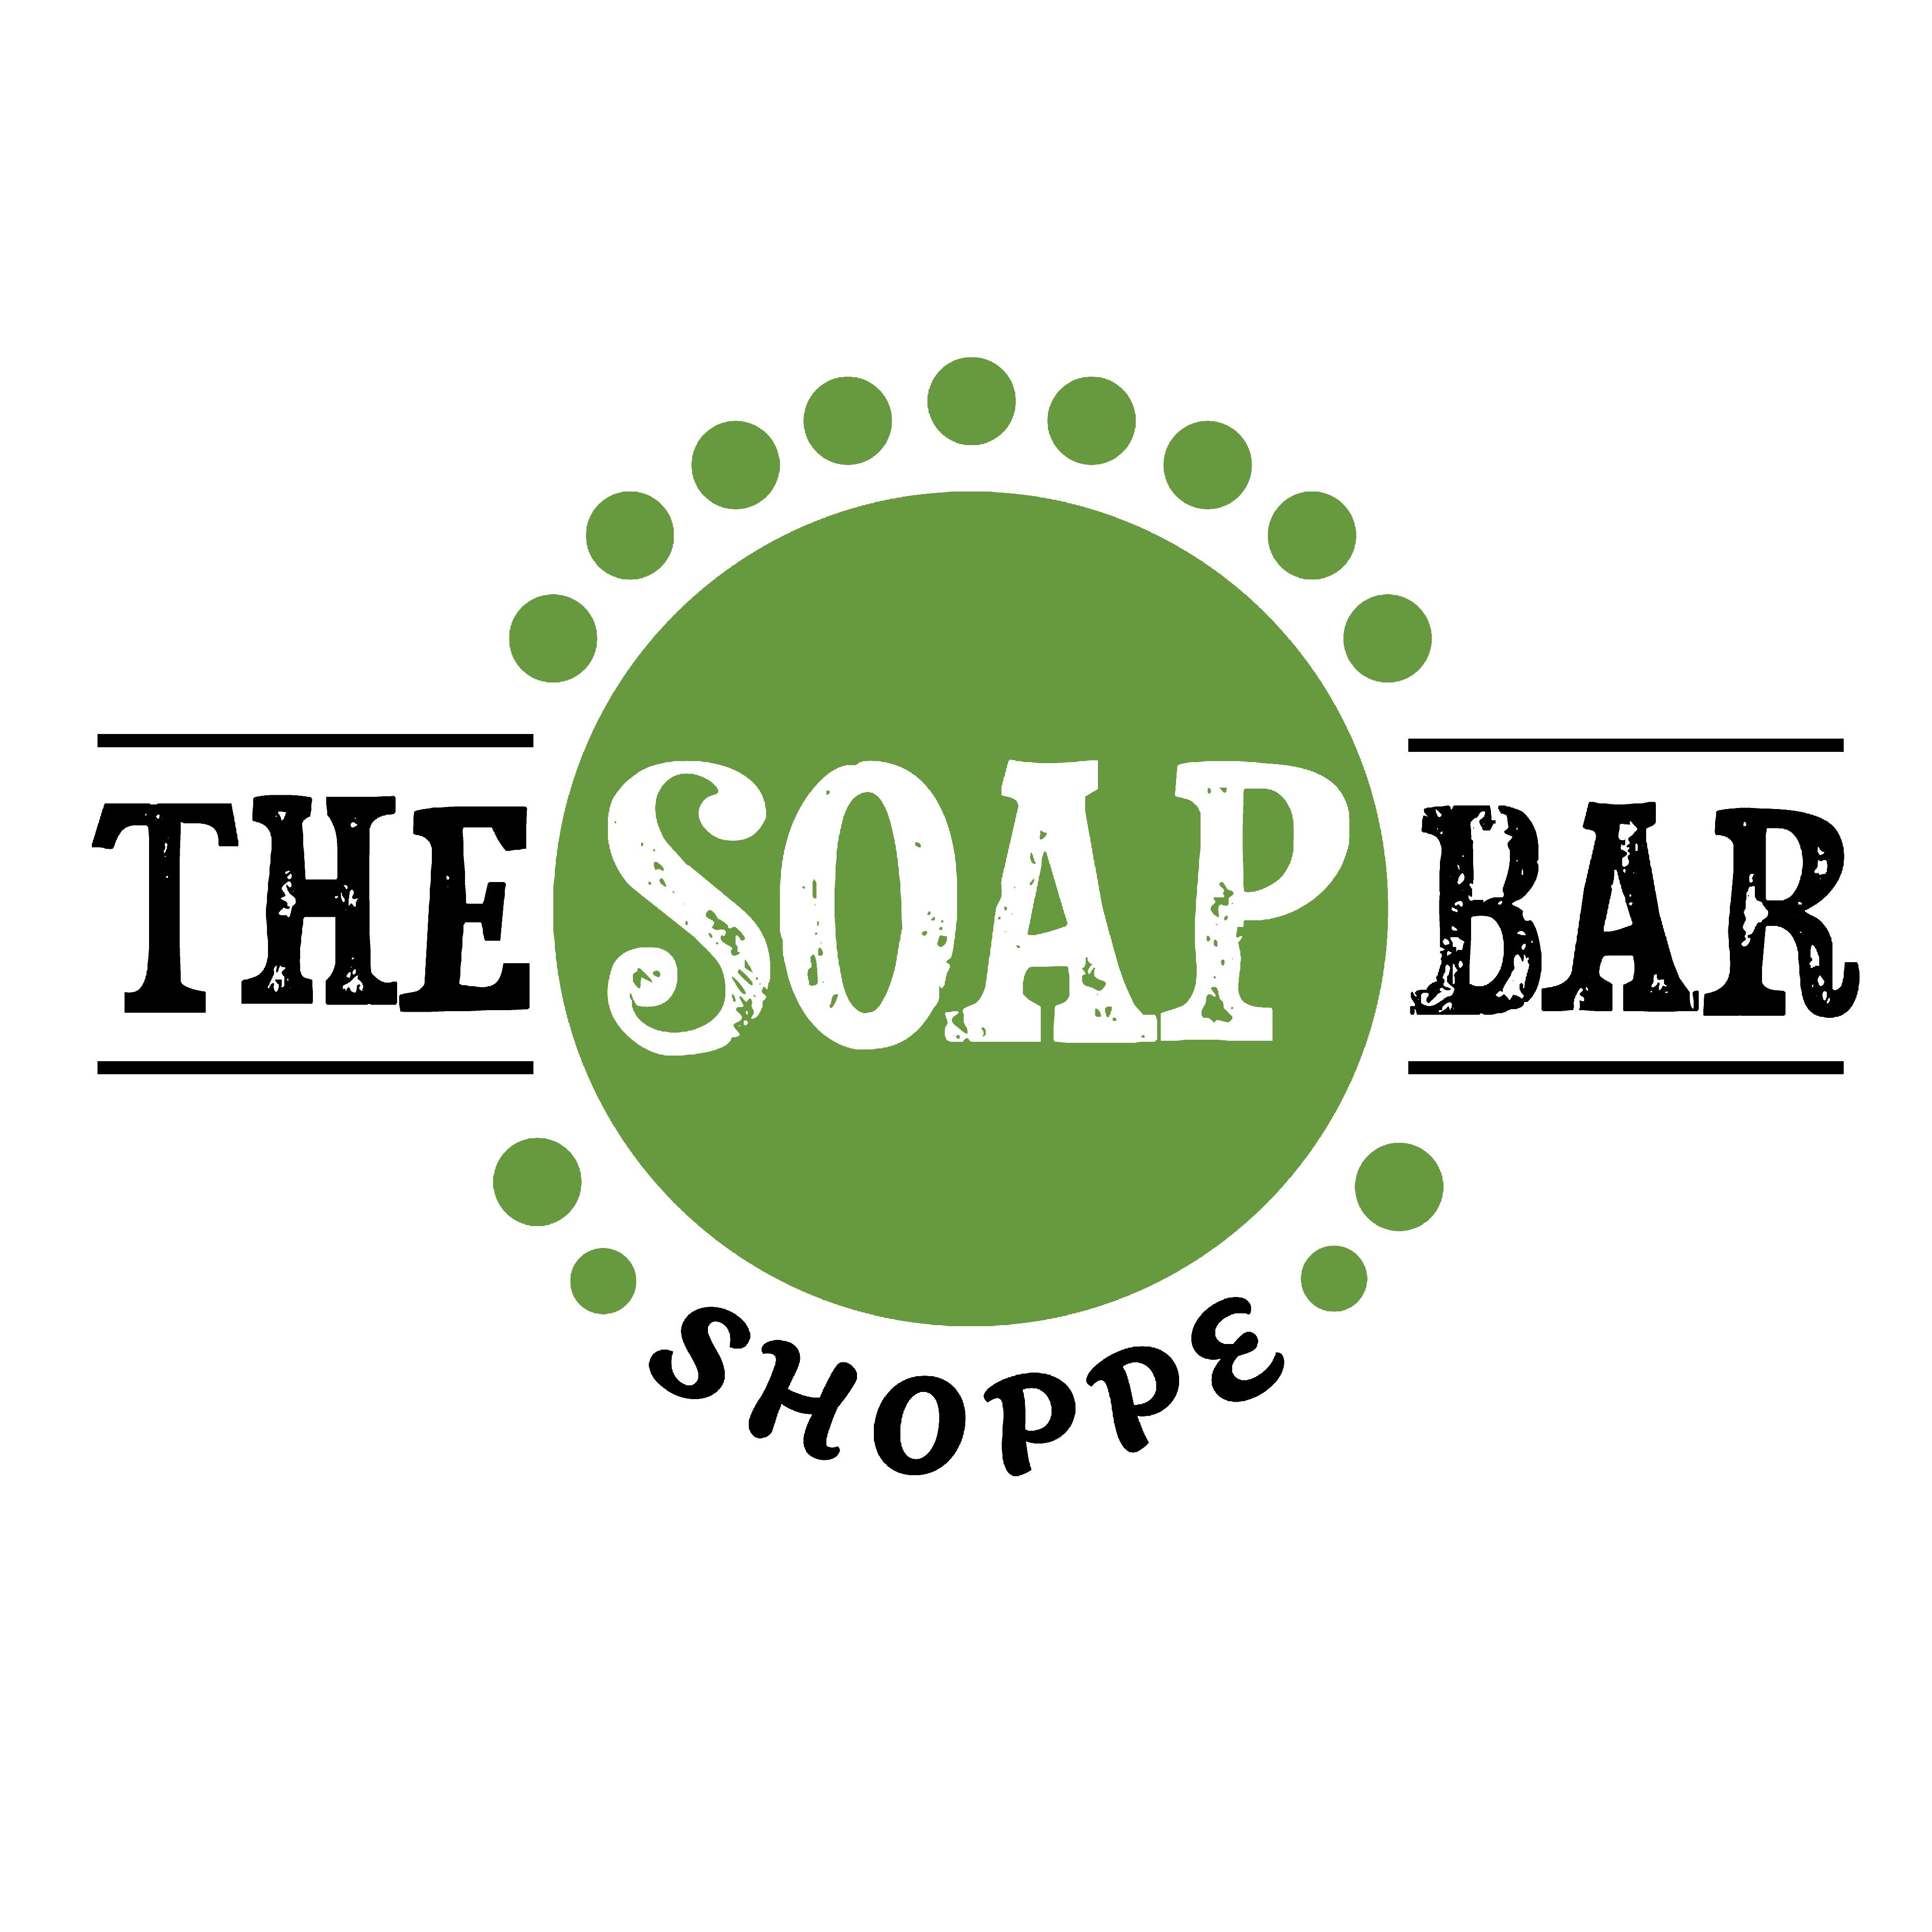 The Soap Bar Shoppe